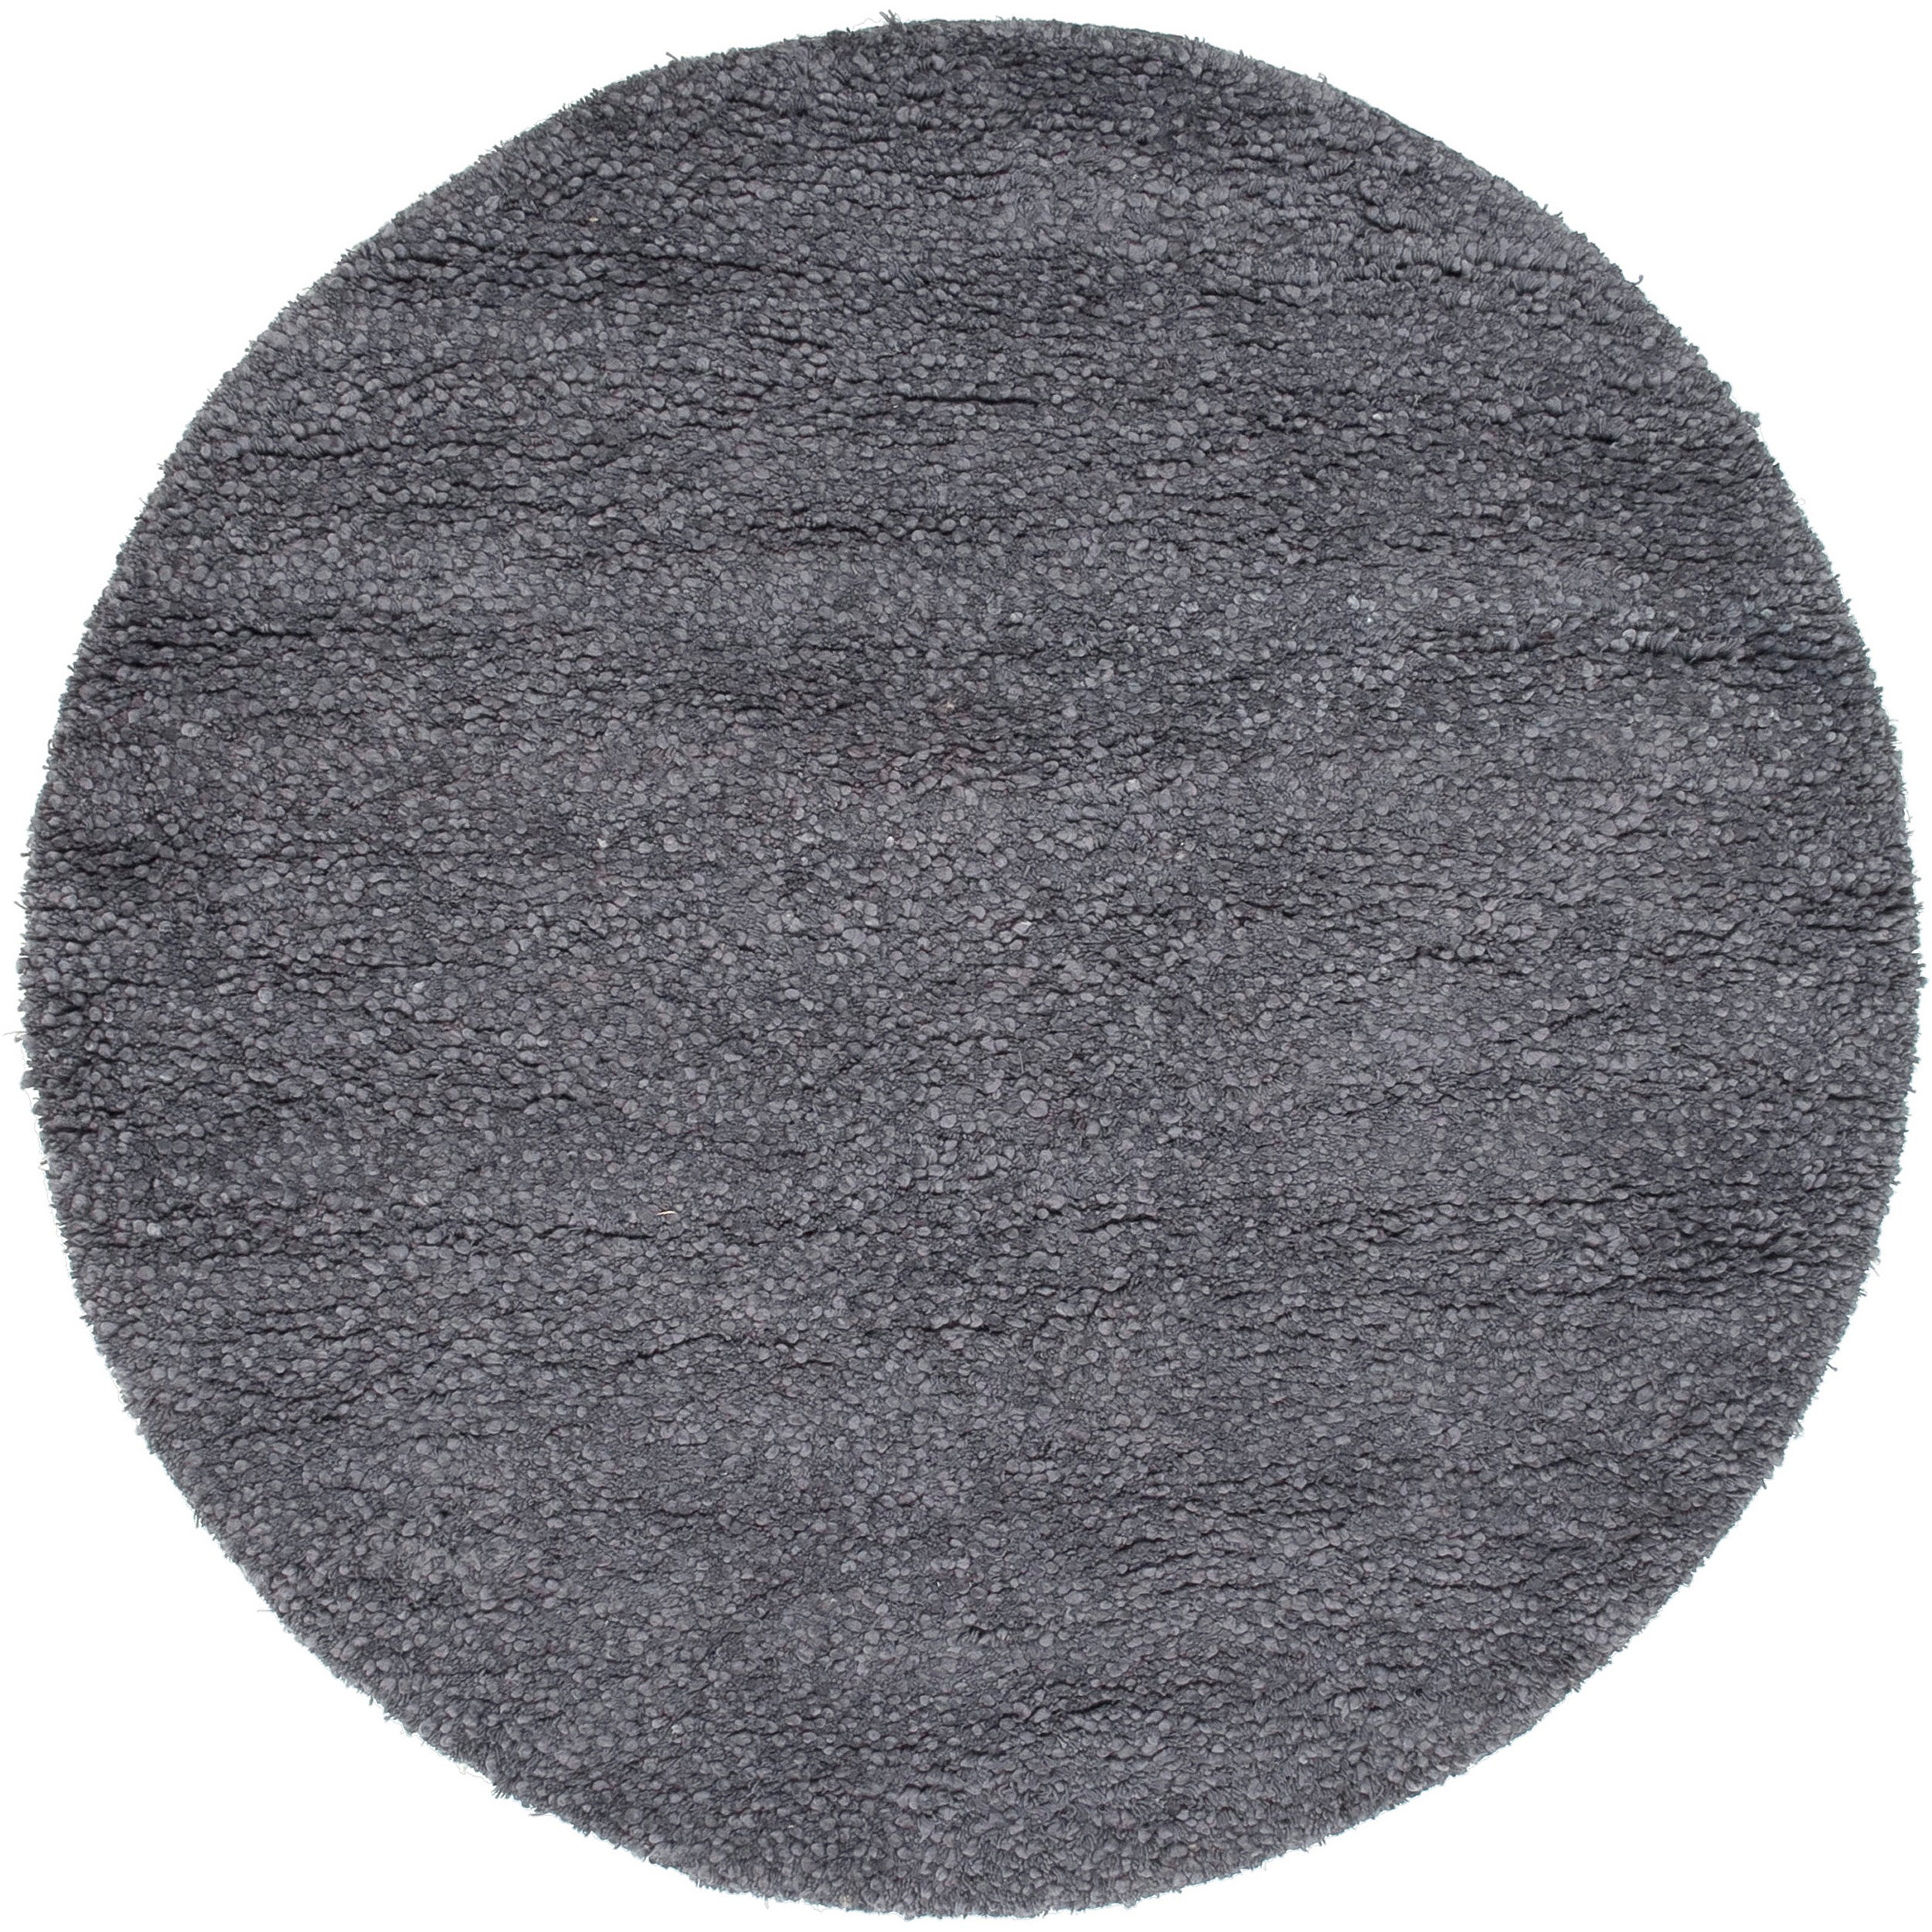 Hand-woven Metropolitan New Zealand Wool Plush Shag Rug (8